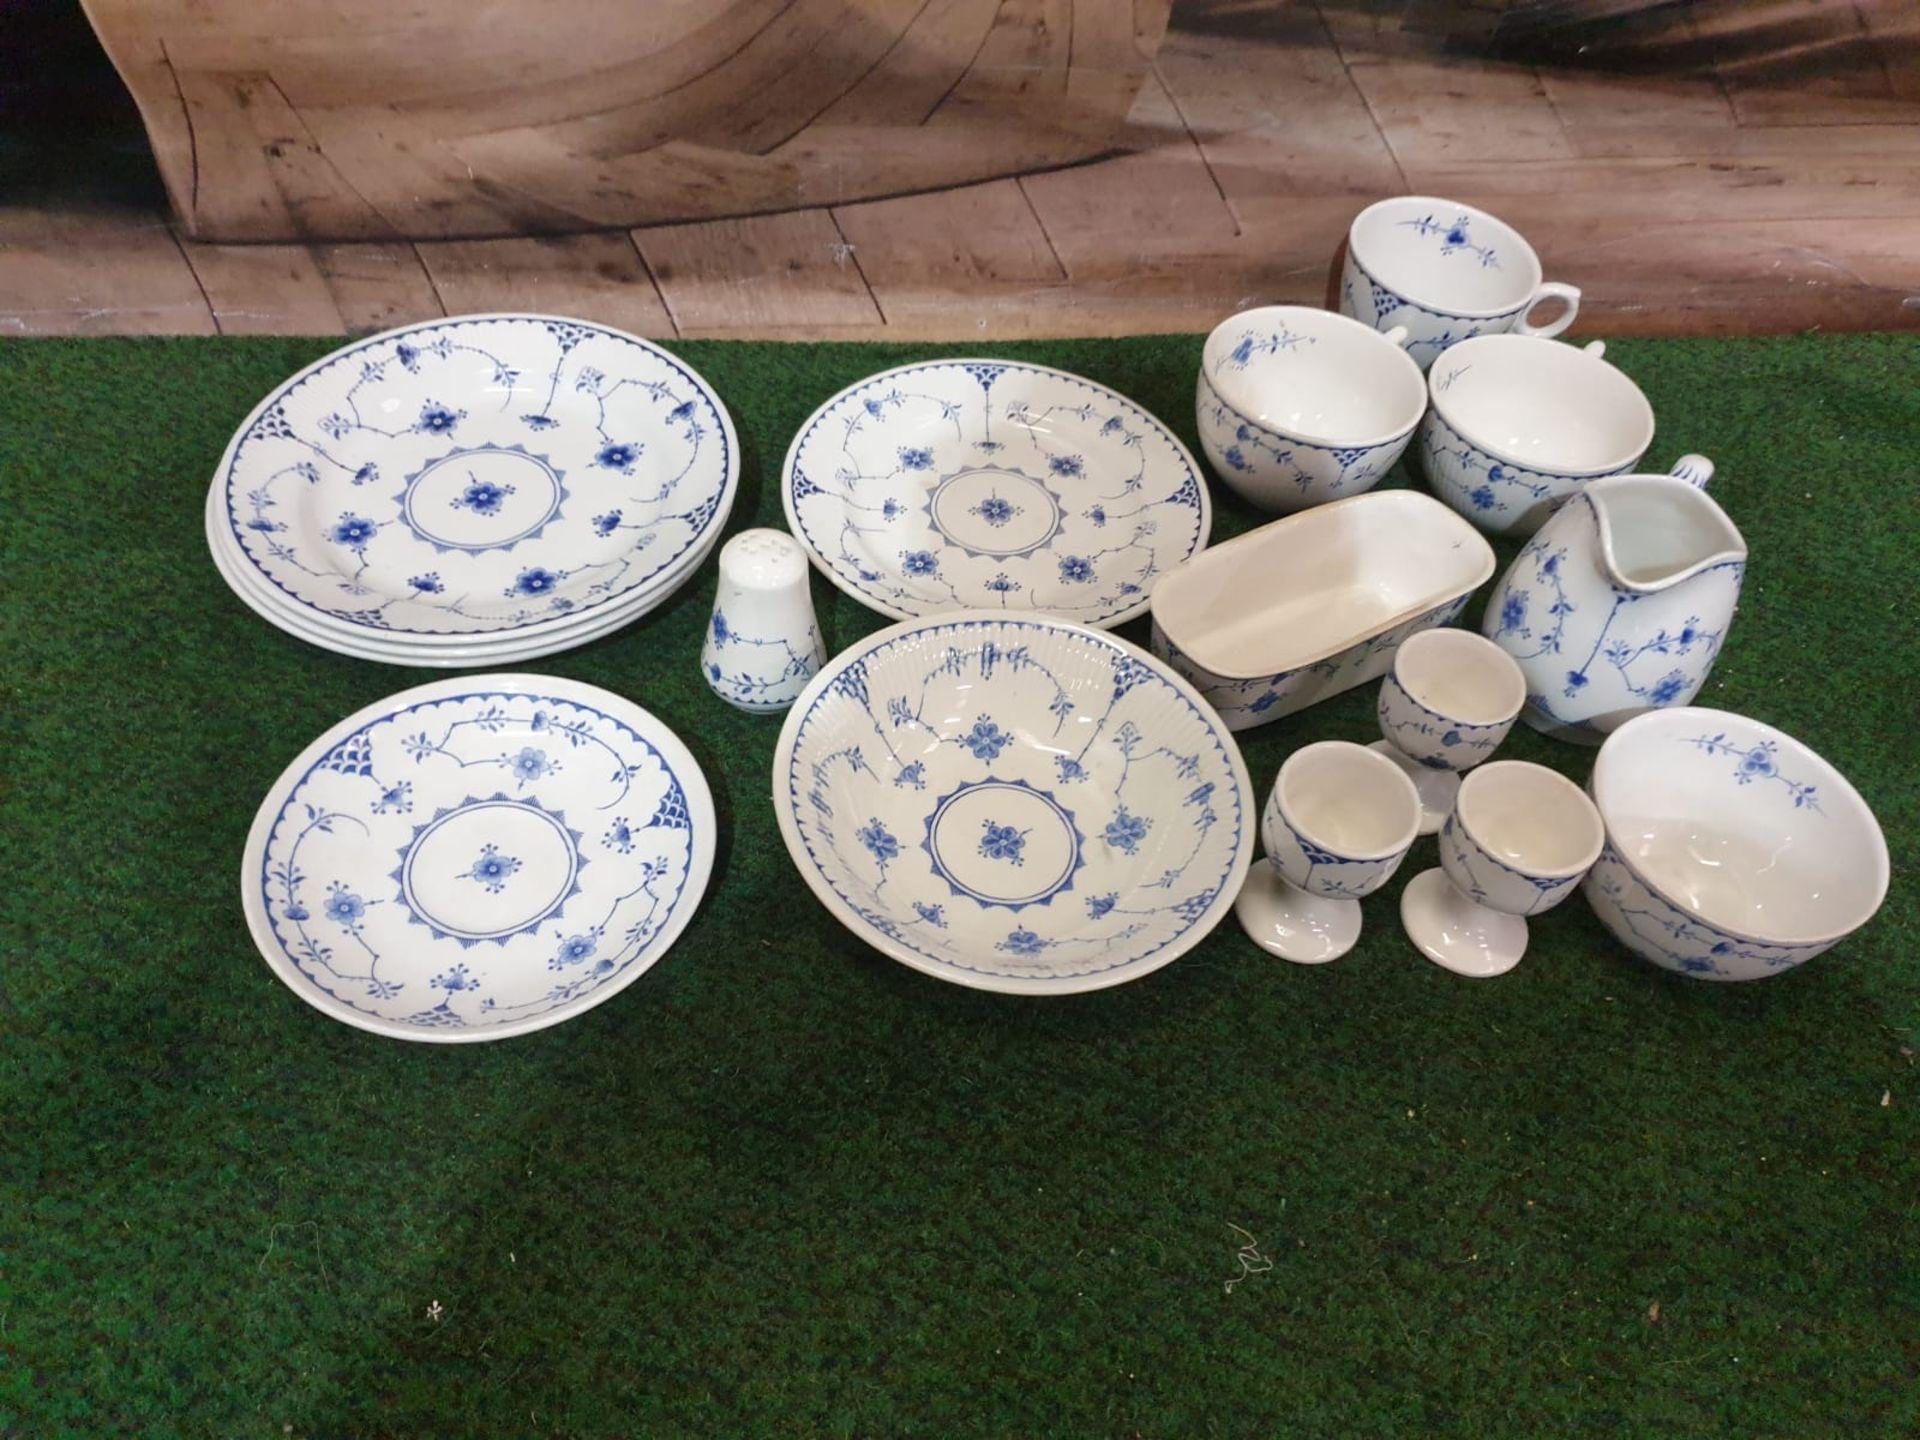 Furnivals Denmark – Blue partial tea service comprising of 3x plates 1x service plates 1x saucer